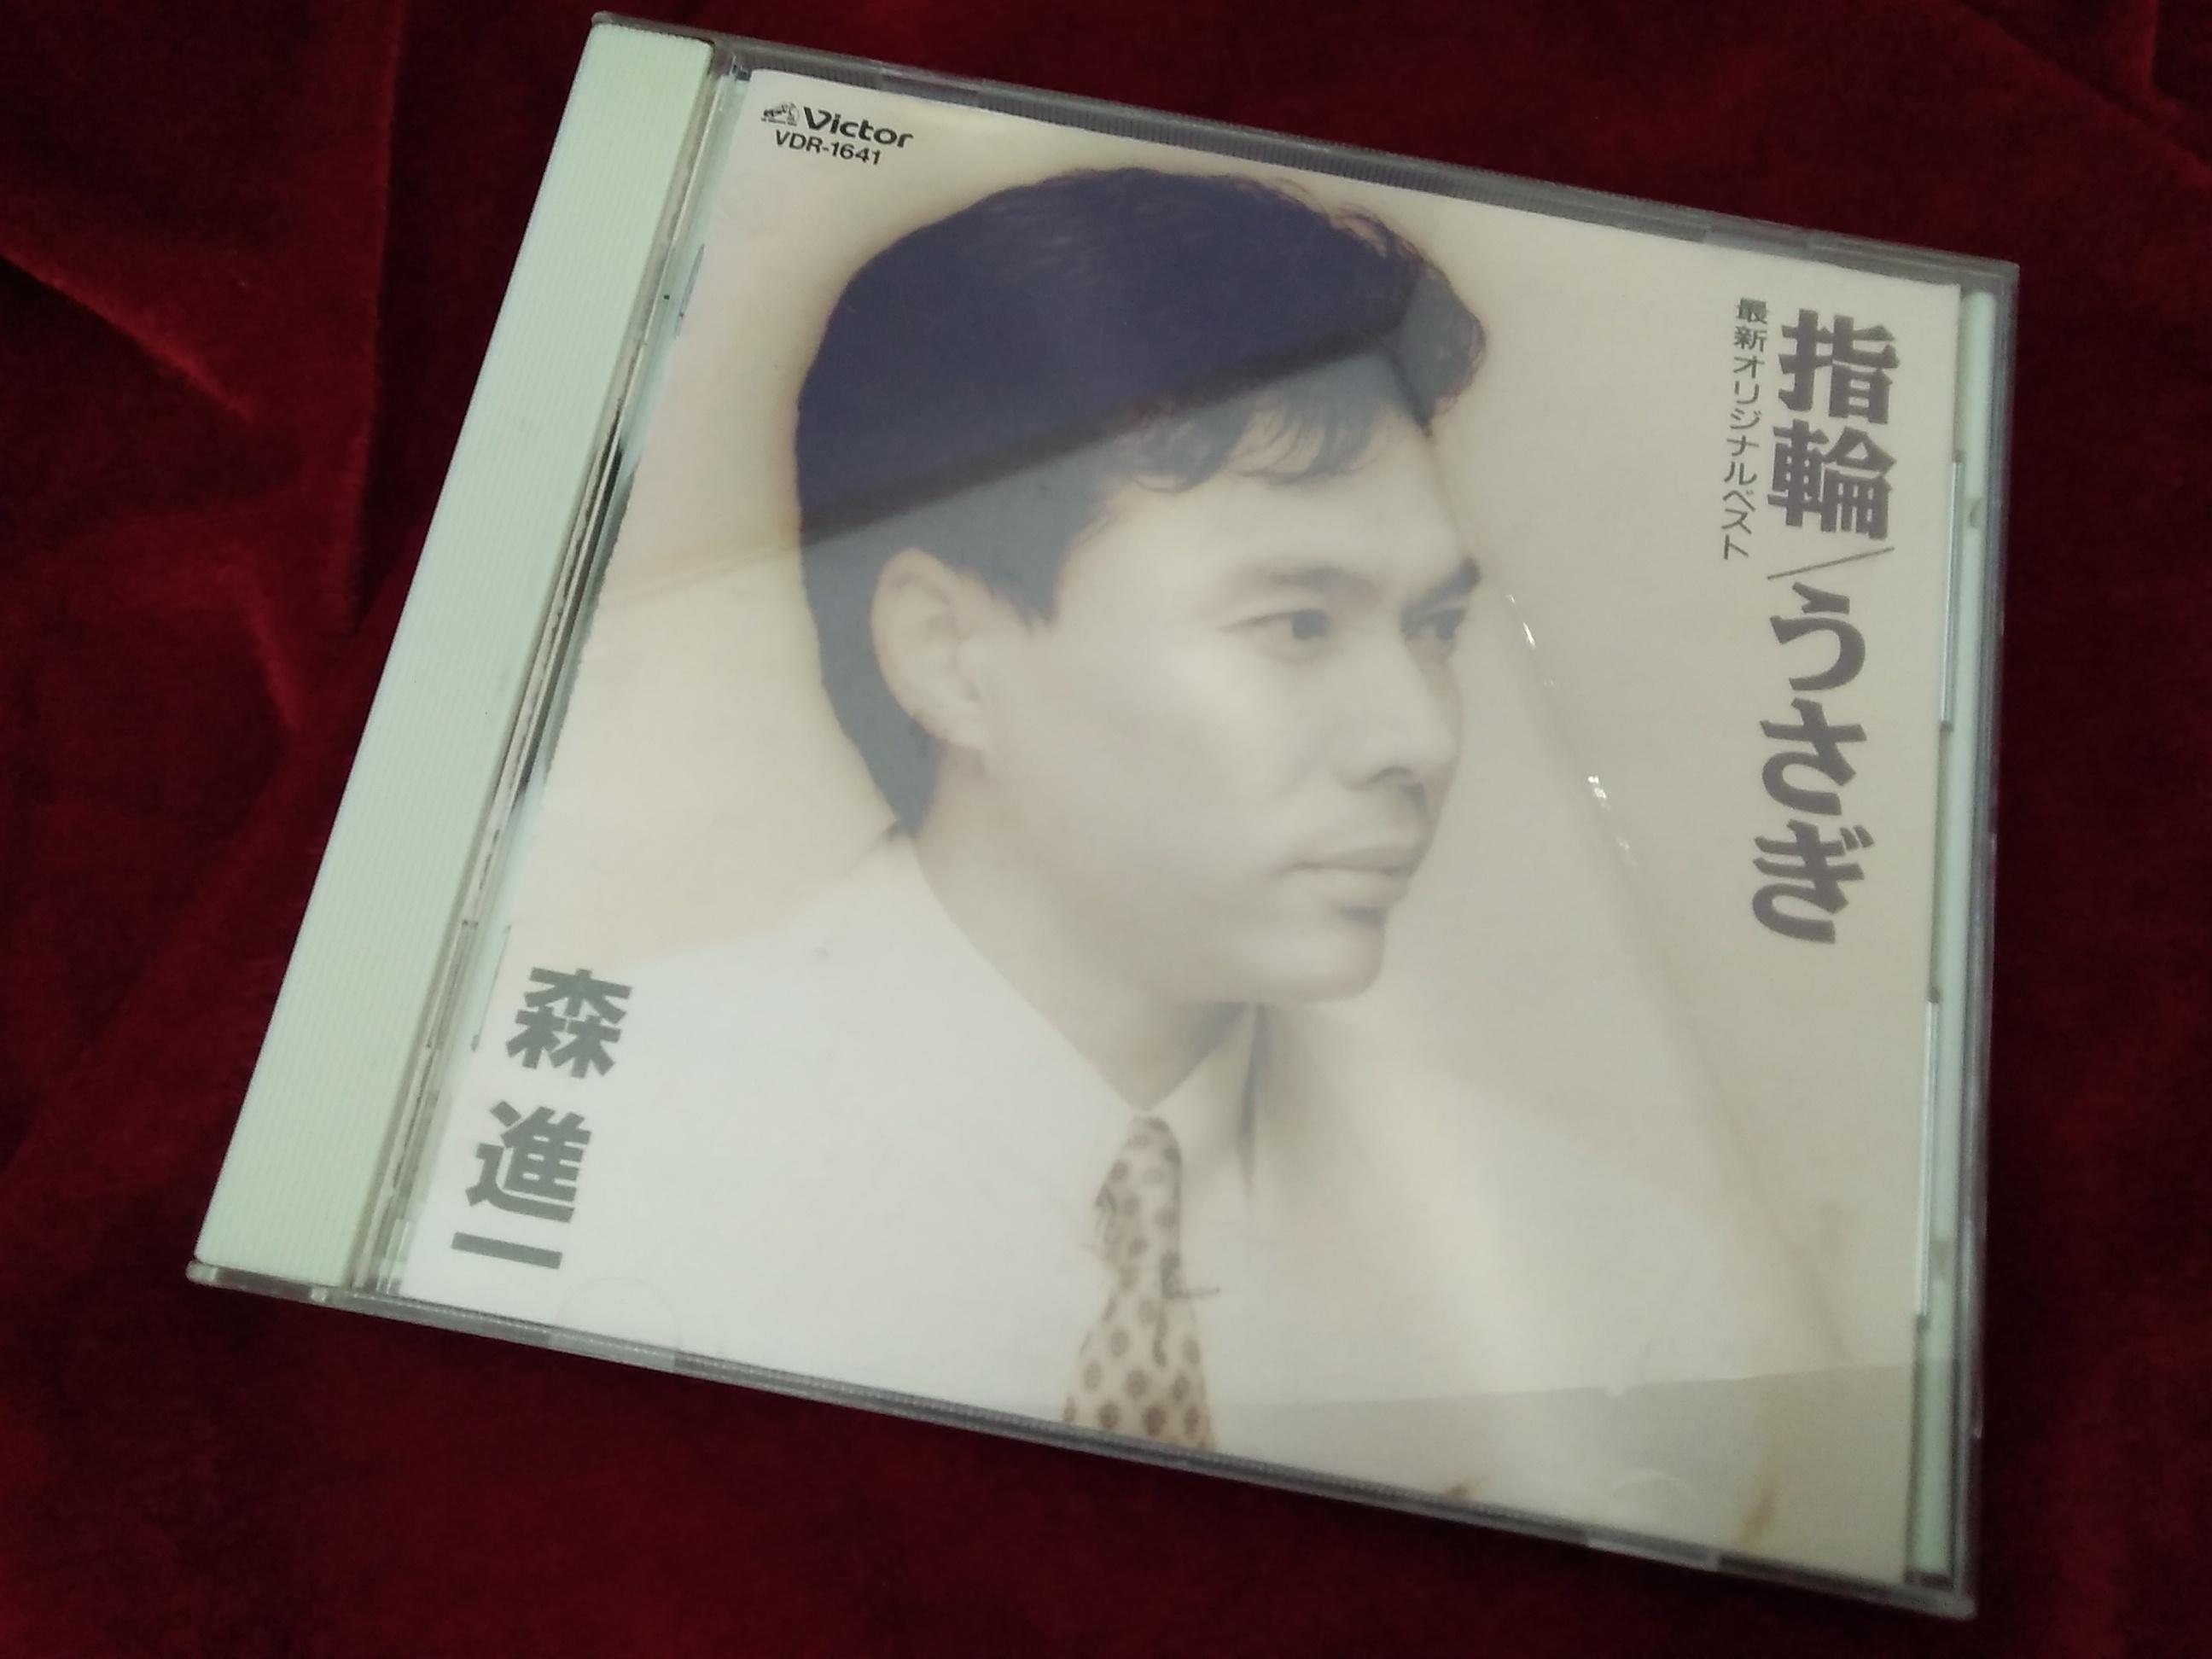 邦楽 CD演歌歌謡曲「も」